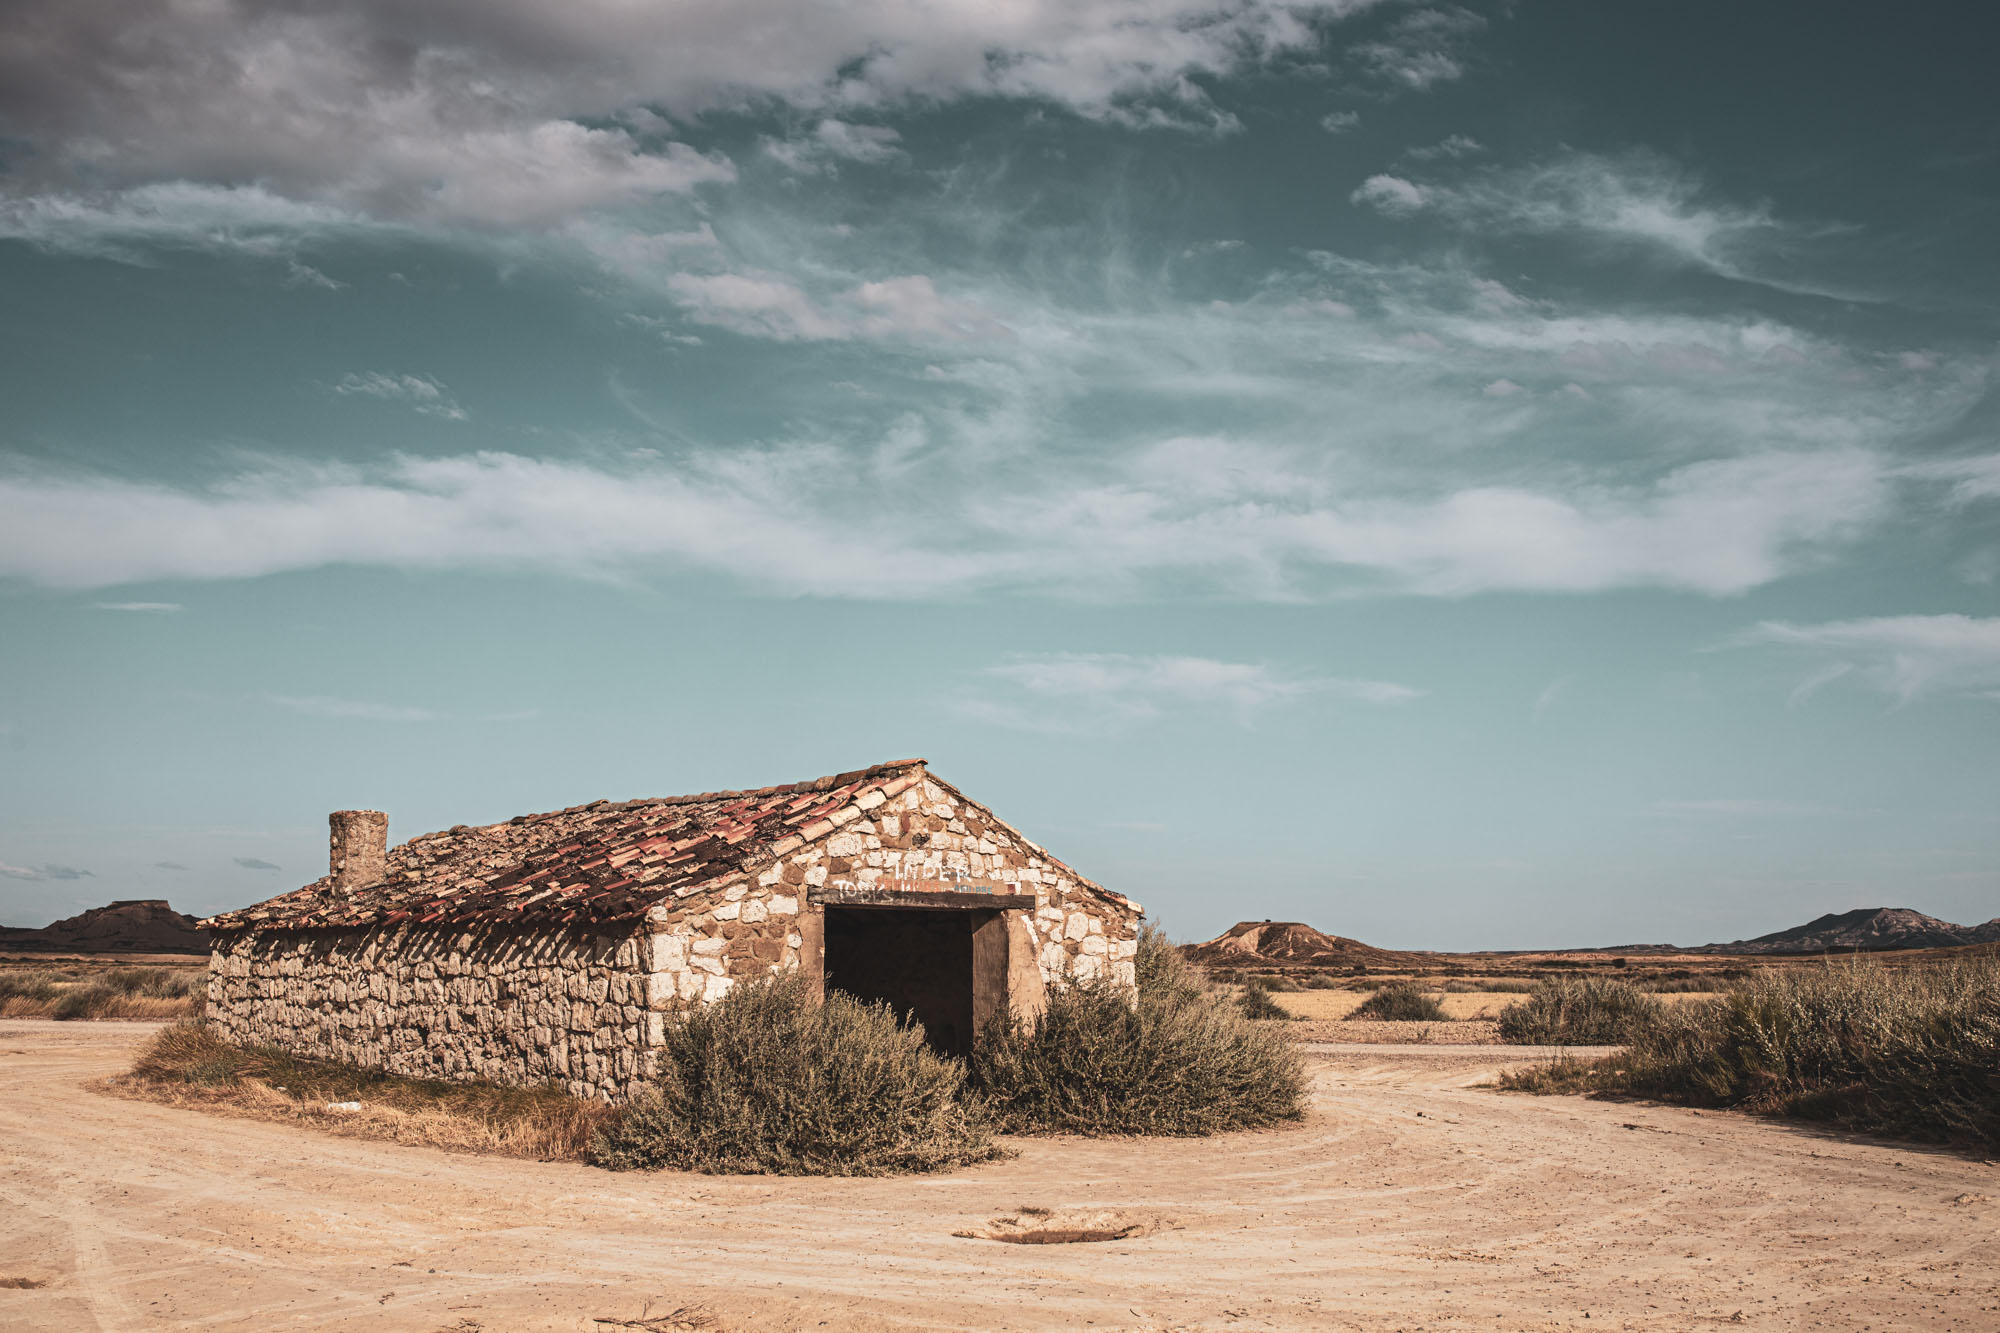 Desert des bardenas - tirage d'art à commander